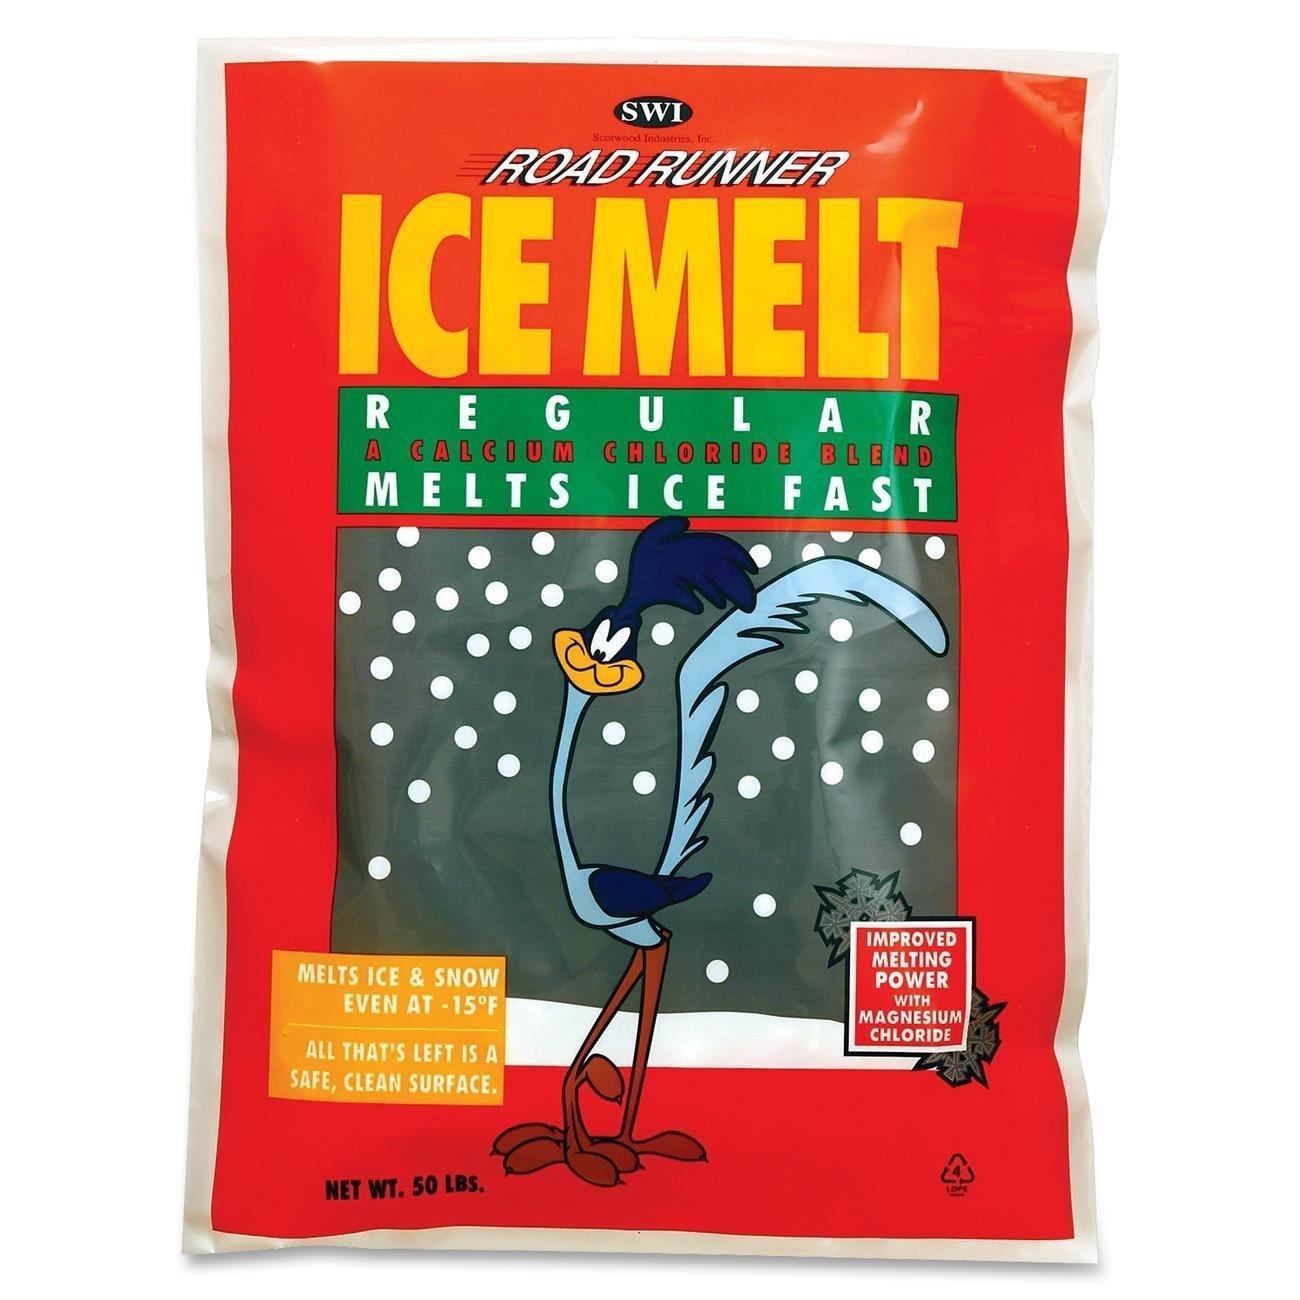 Road Runner Premium Magnesium Chloride Ice Melt 50 lb Bag